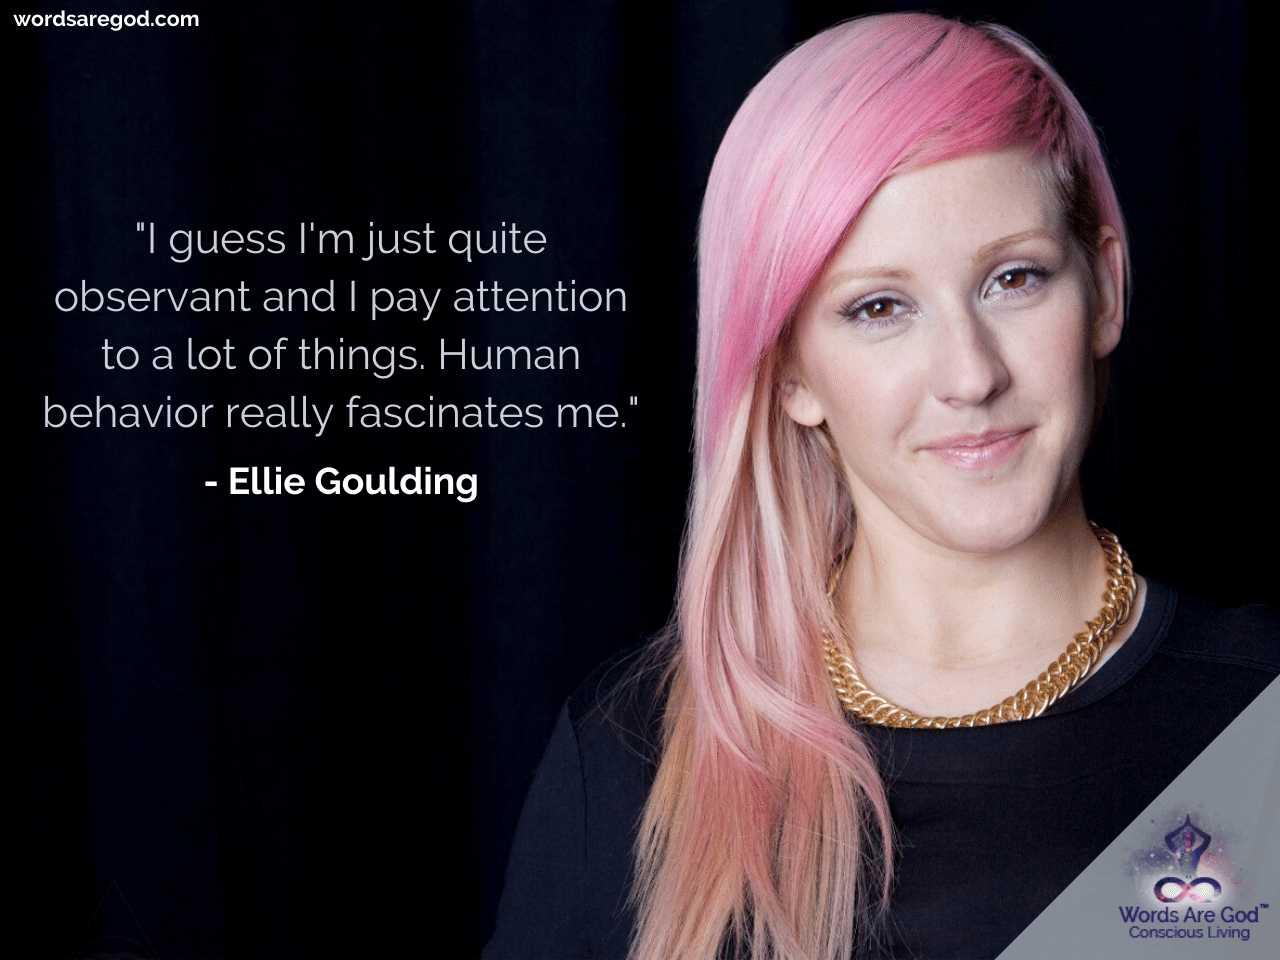 Ellie Goulding Motivational Quotes by Ellie Goulding